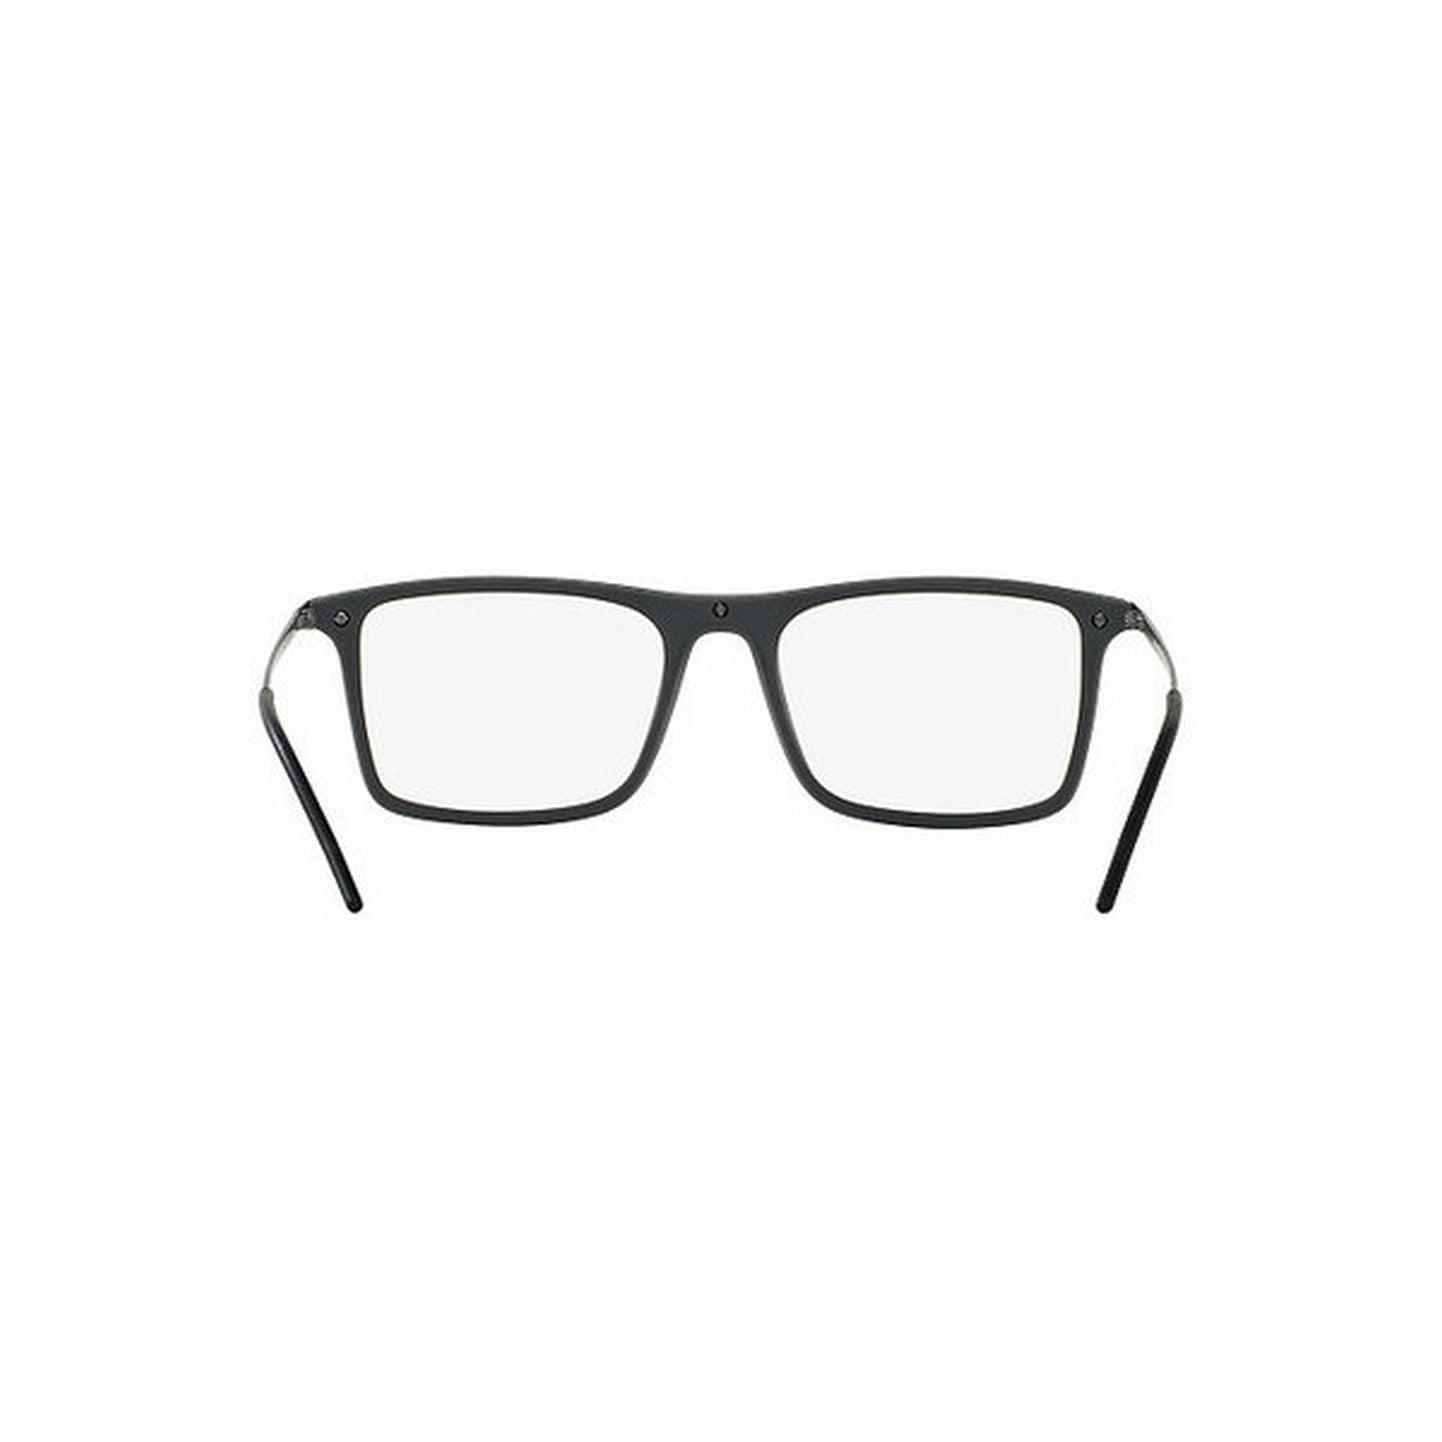 6210b149254 Shop Emporio Armani Men s EA1058 3003 53 Rectangle Metal Gunmetal Clear  Eyeglasses - Ships To Canada - Overstock - 14779649